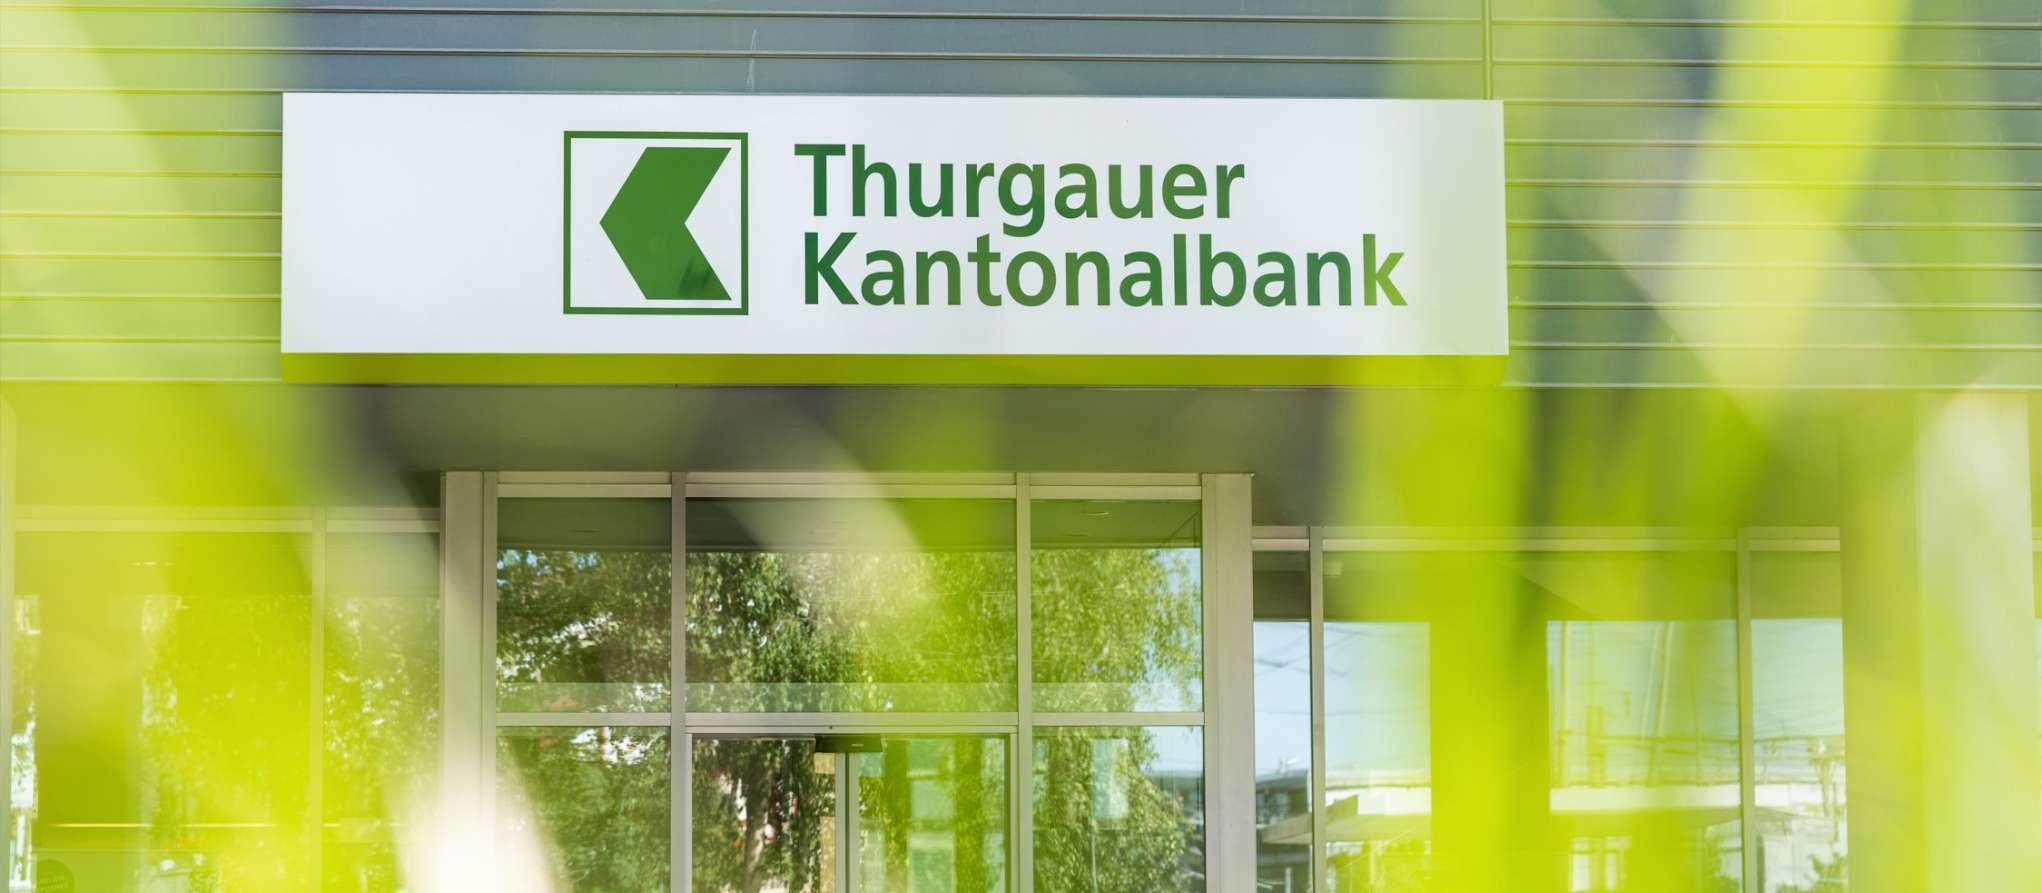 Hauptsitz der Thurgauer Kantonalbank in Weinfelden